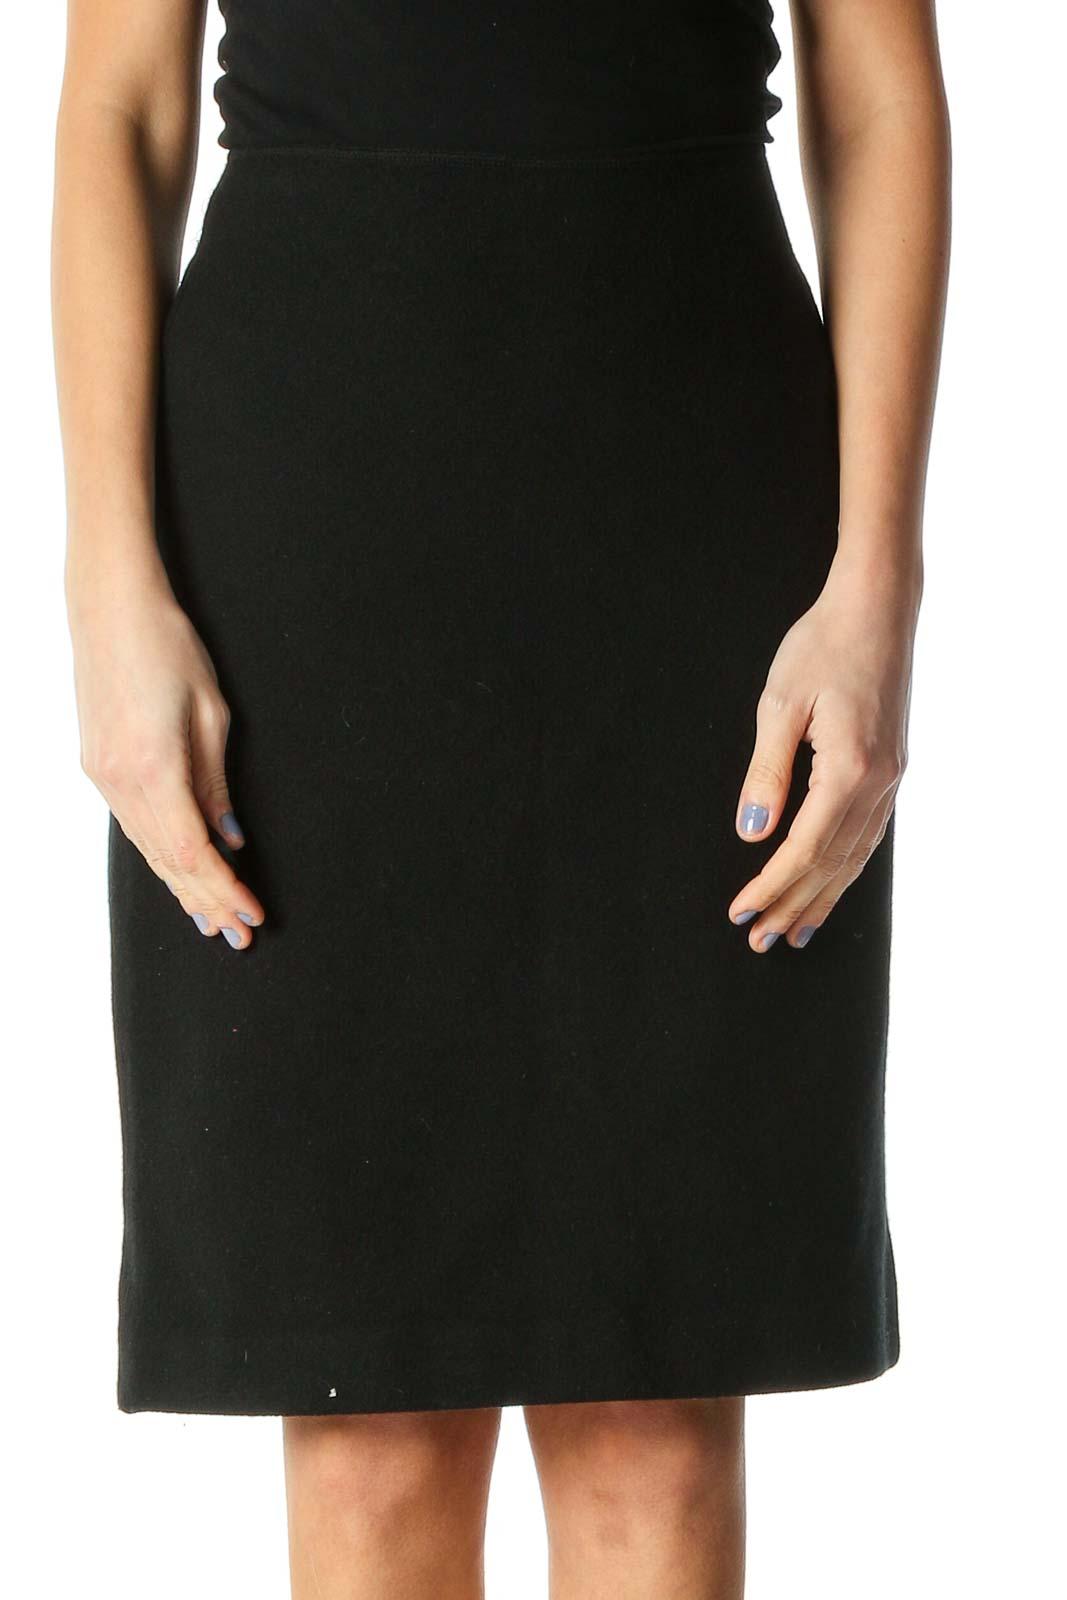 Black Colorblock Classic Pencil Skirt Front